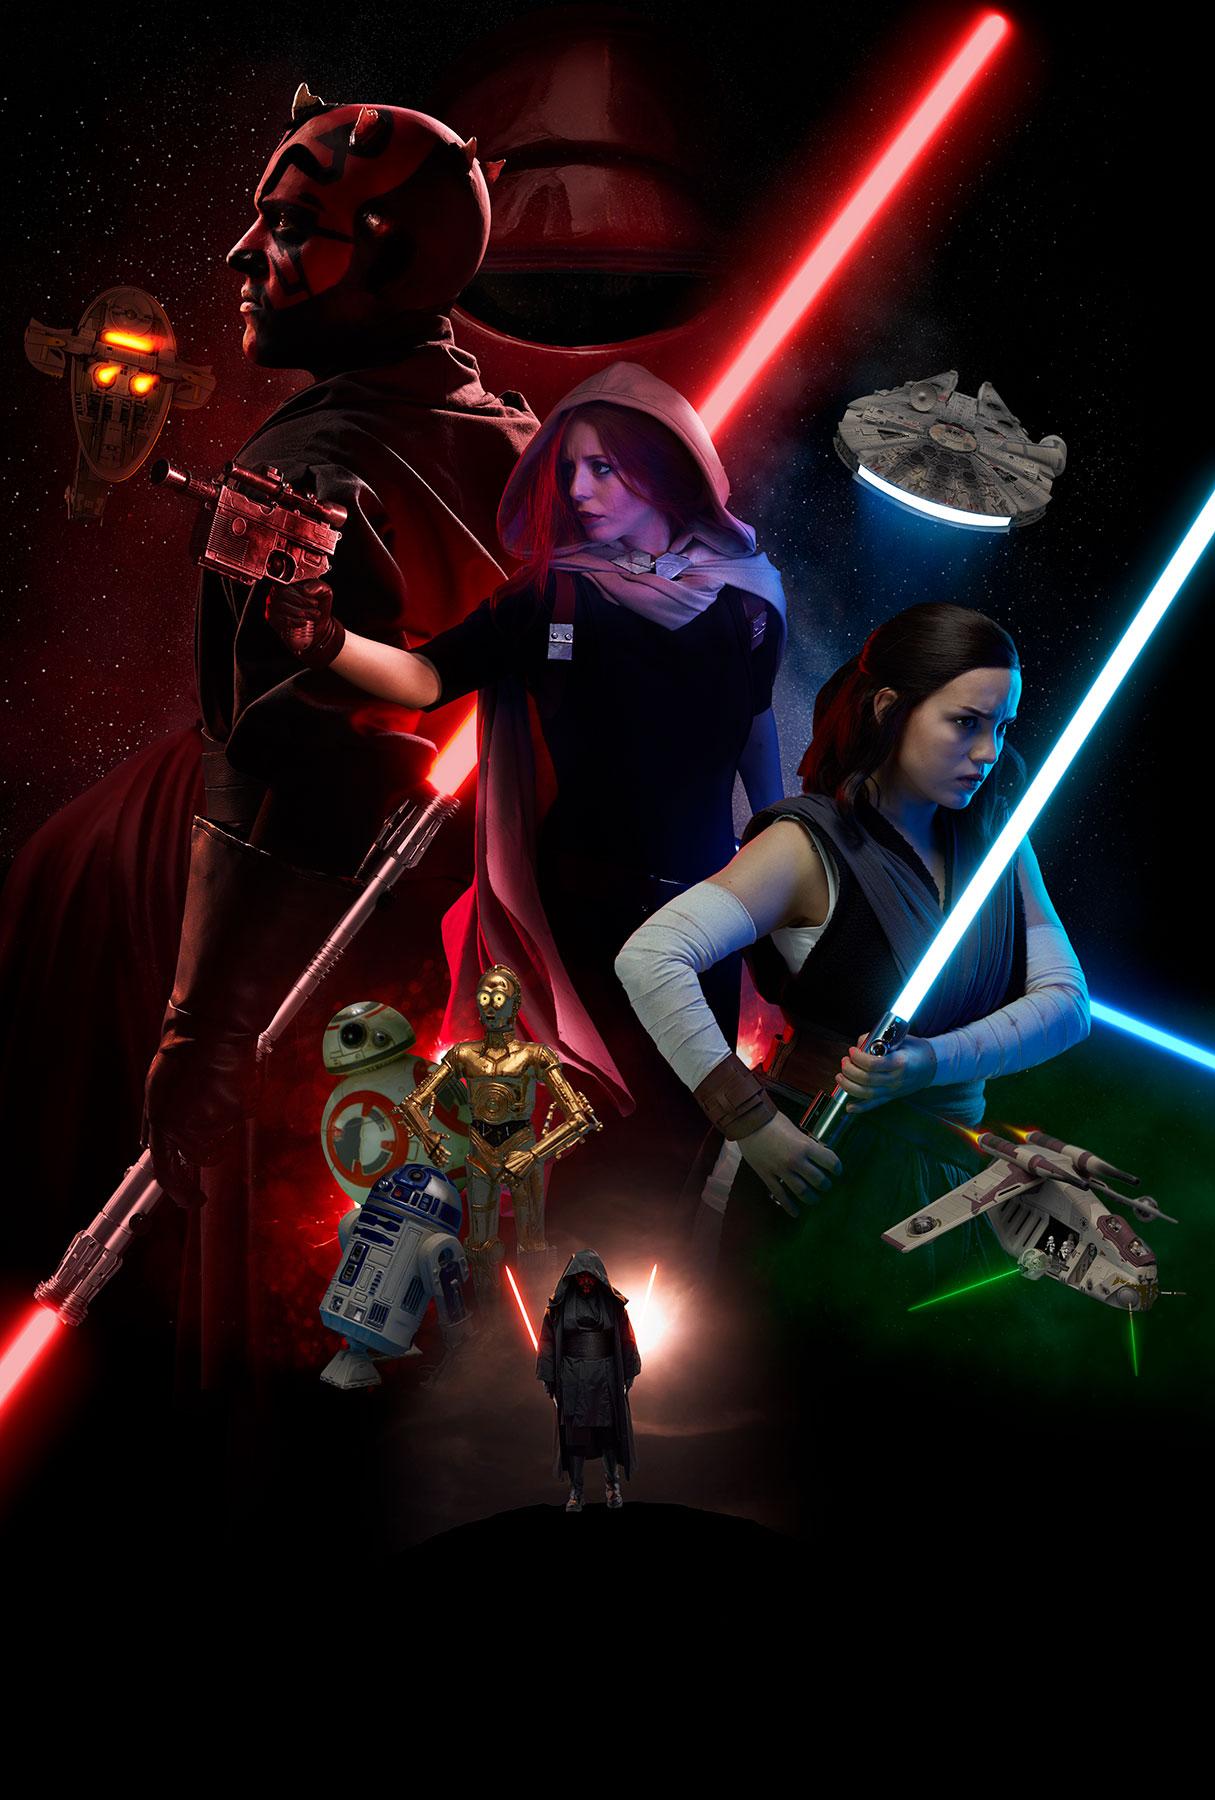 Sayanoff Arthur Star Wars Poster 02 07